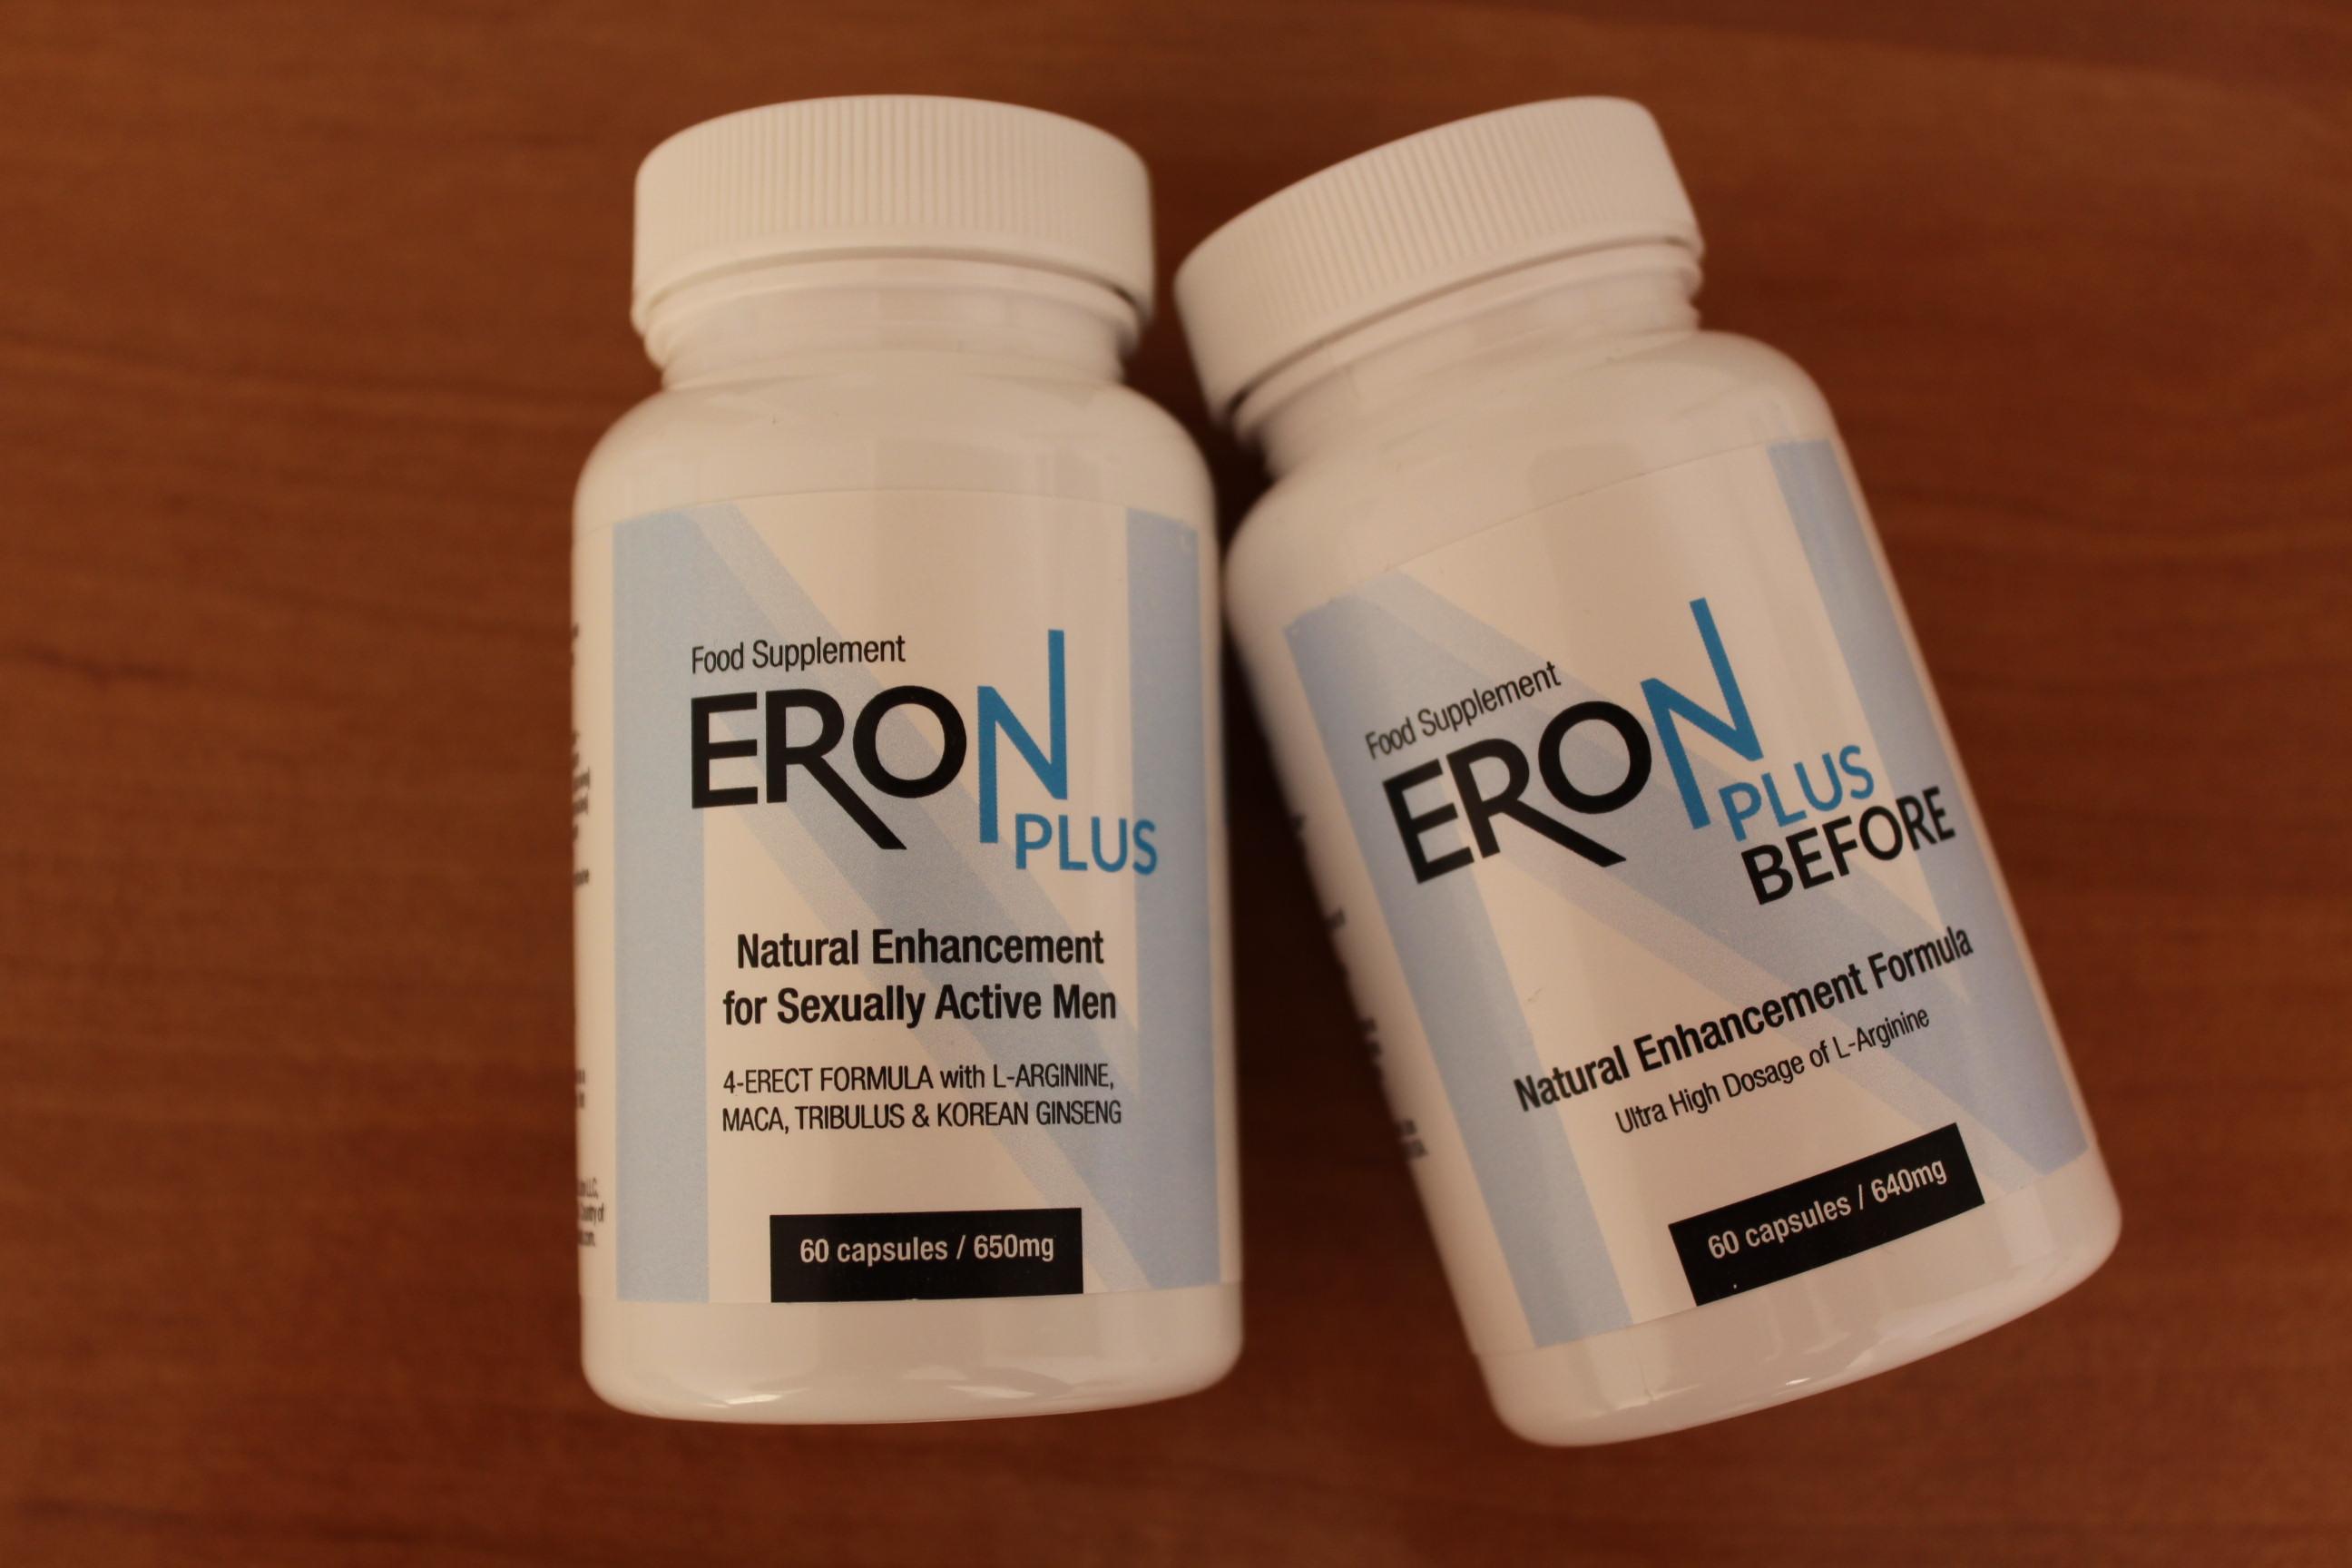 eron plus tabletki na potencję